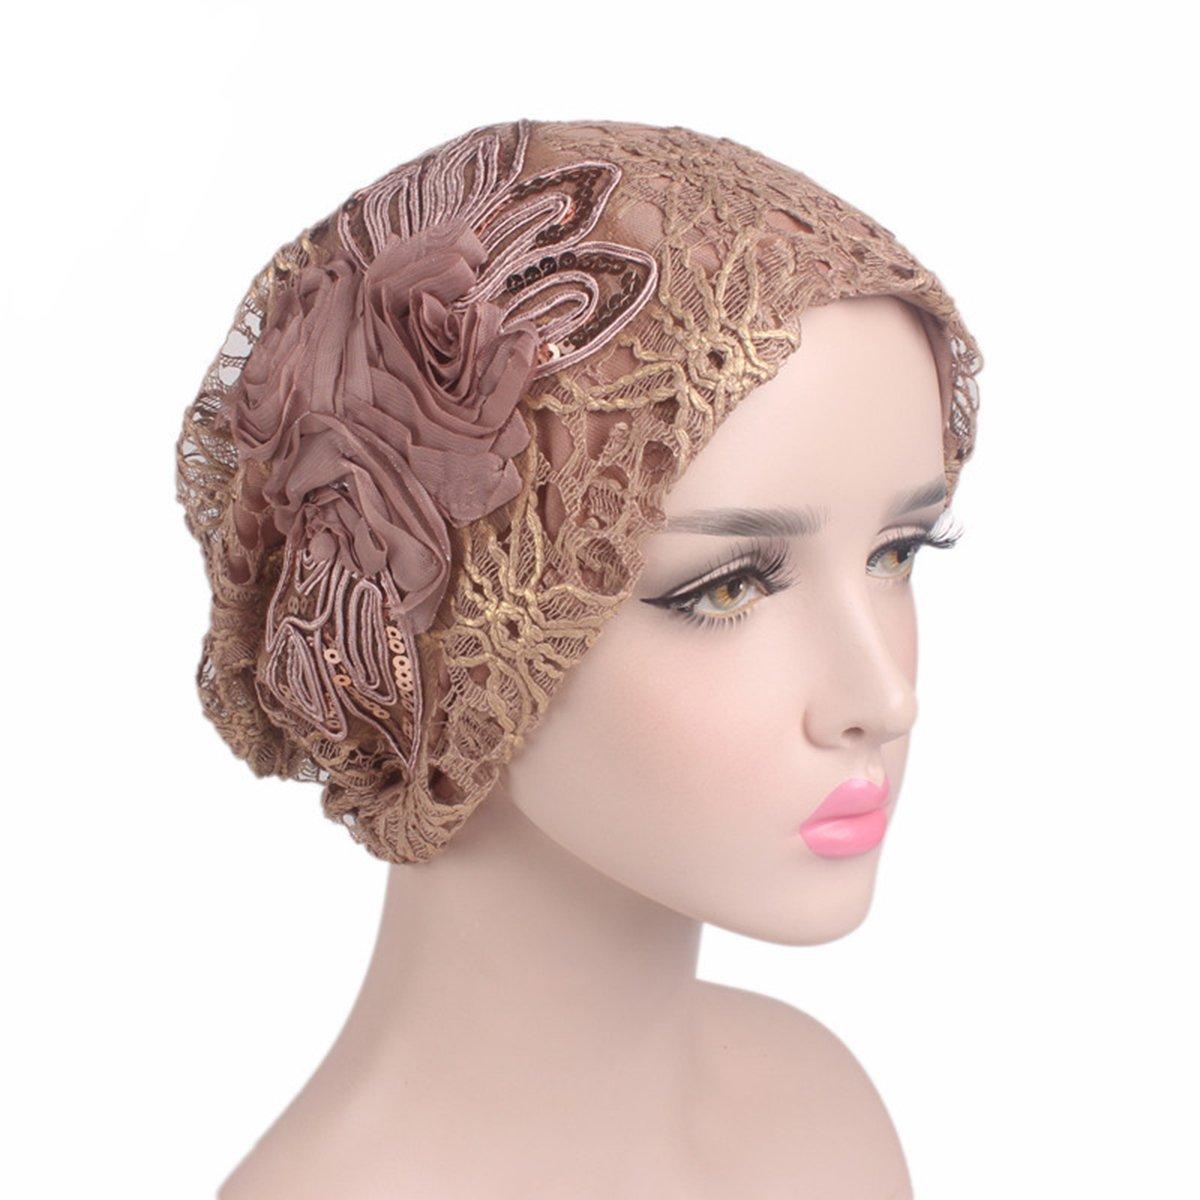 HONENNA Women's Chiffon Lace Floral Mesh Headscarf Cap Chemo Beanie Hat Wraps Turban Headwear for Cancer (Khaki)